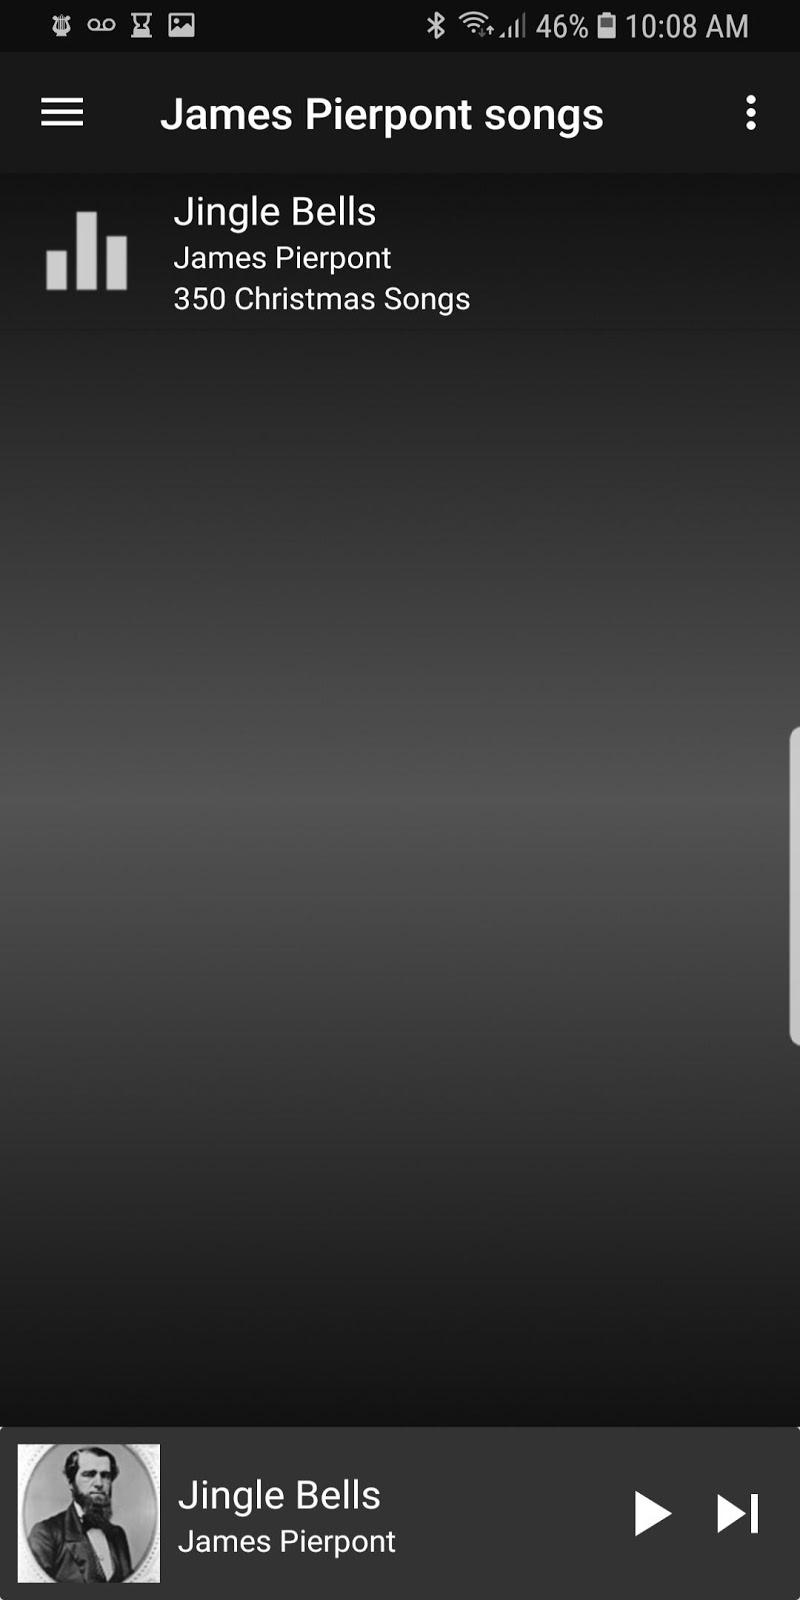 Lyra - Lyrics Music Player and Karaoke Screenshot 3